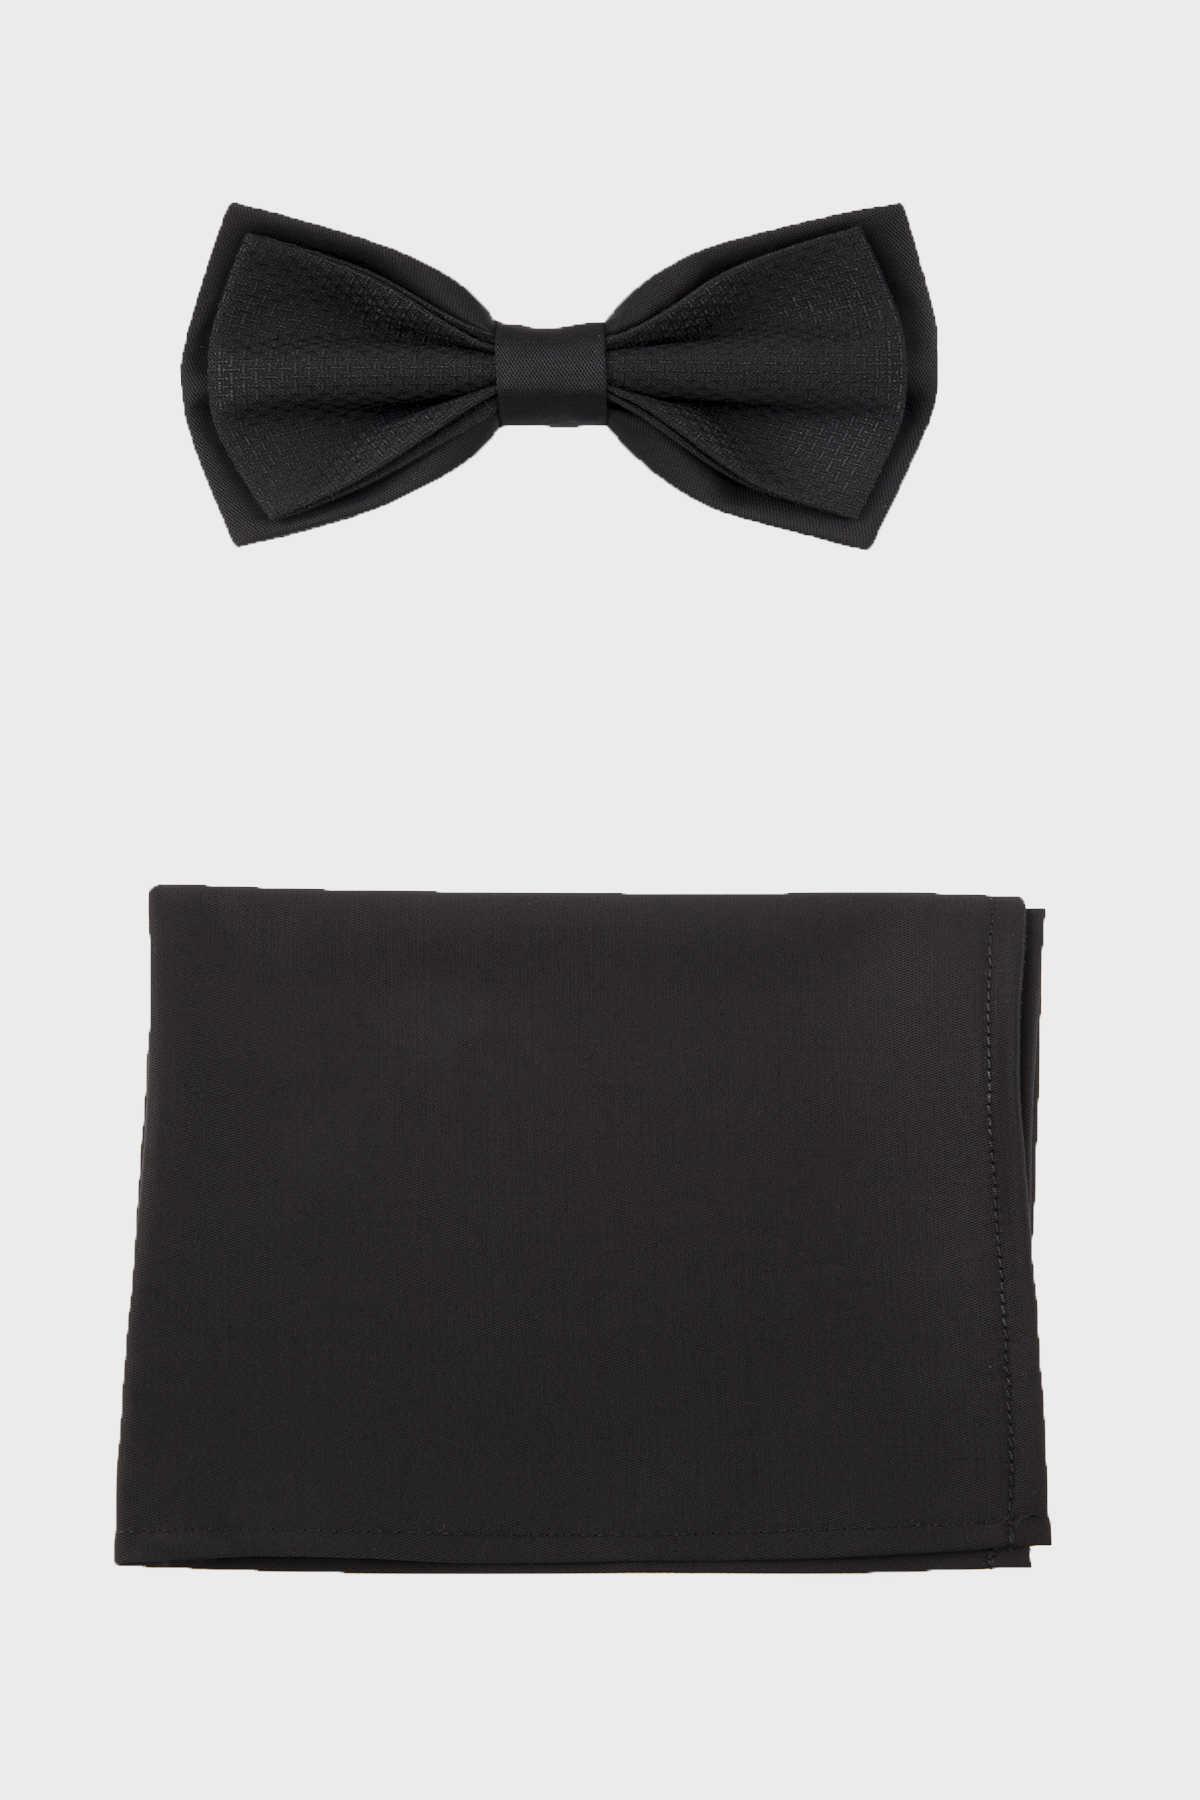 Bow Tie-Handkerchief Set 26172119C010